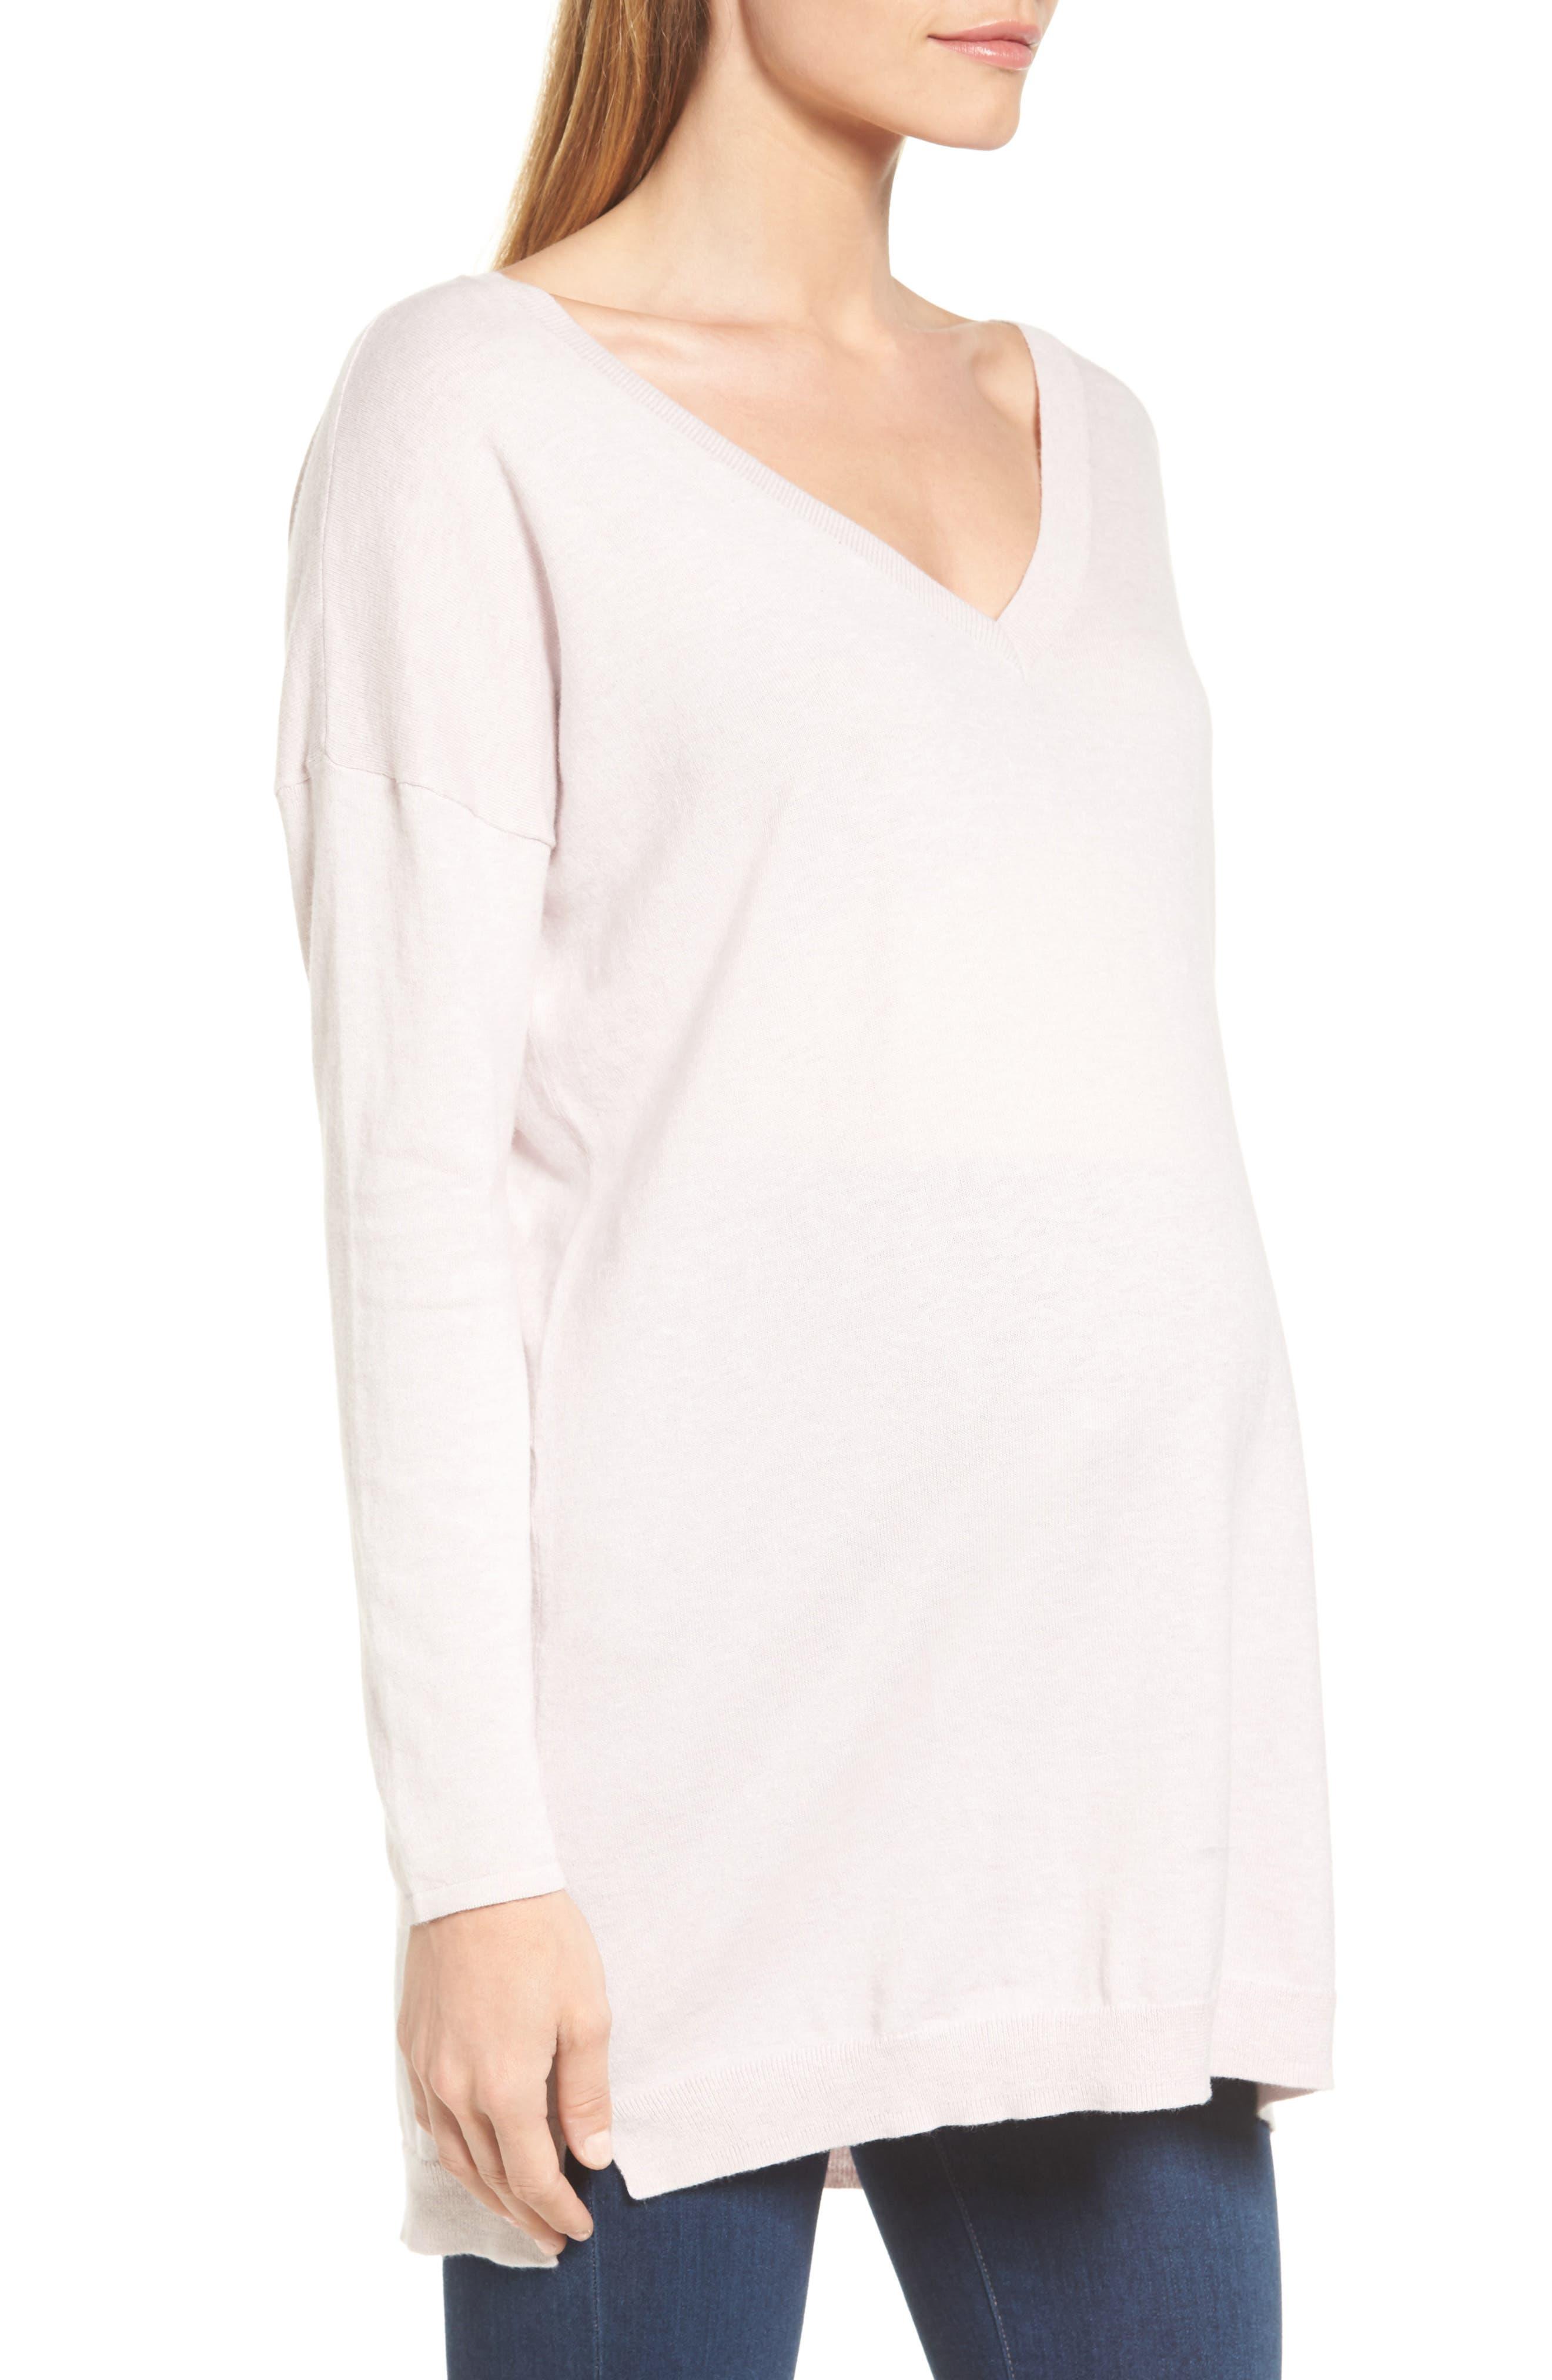 Alternate Image 3  - Tart Maternity Abella Maternity Sweater